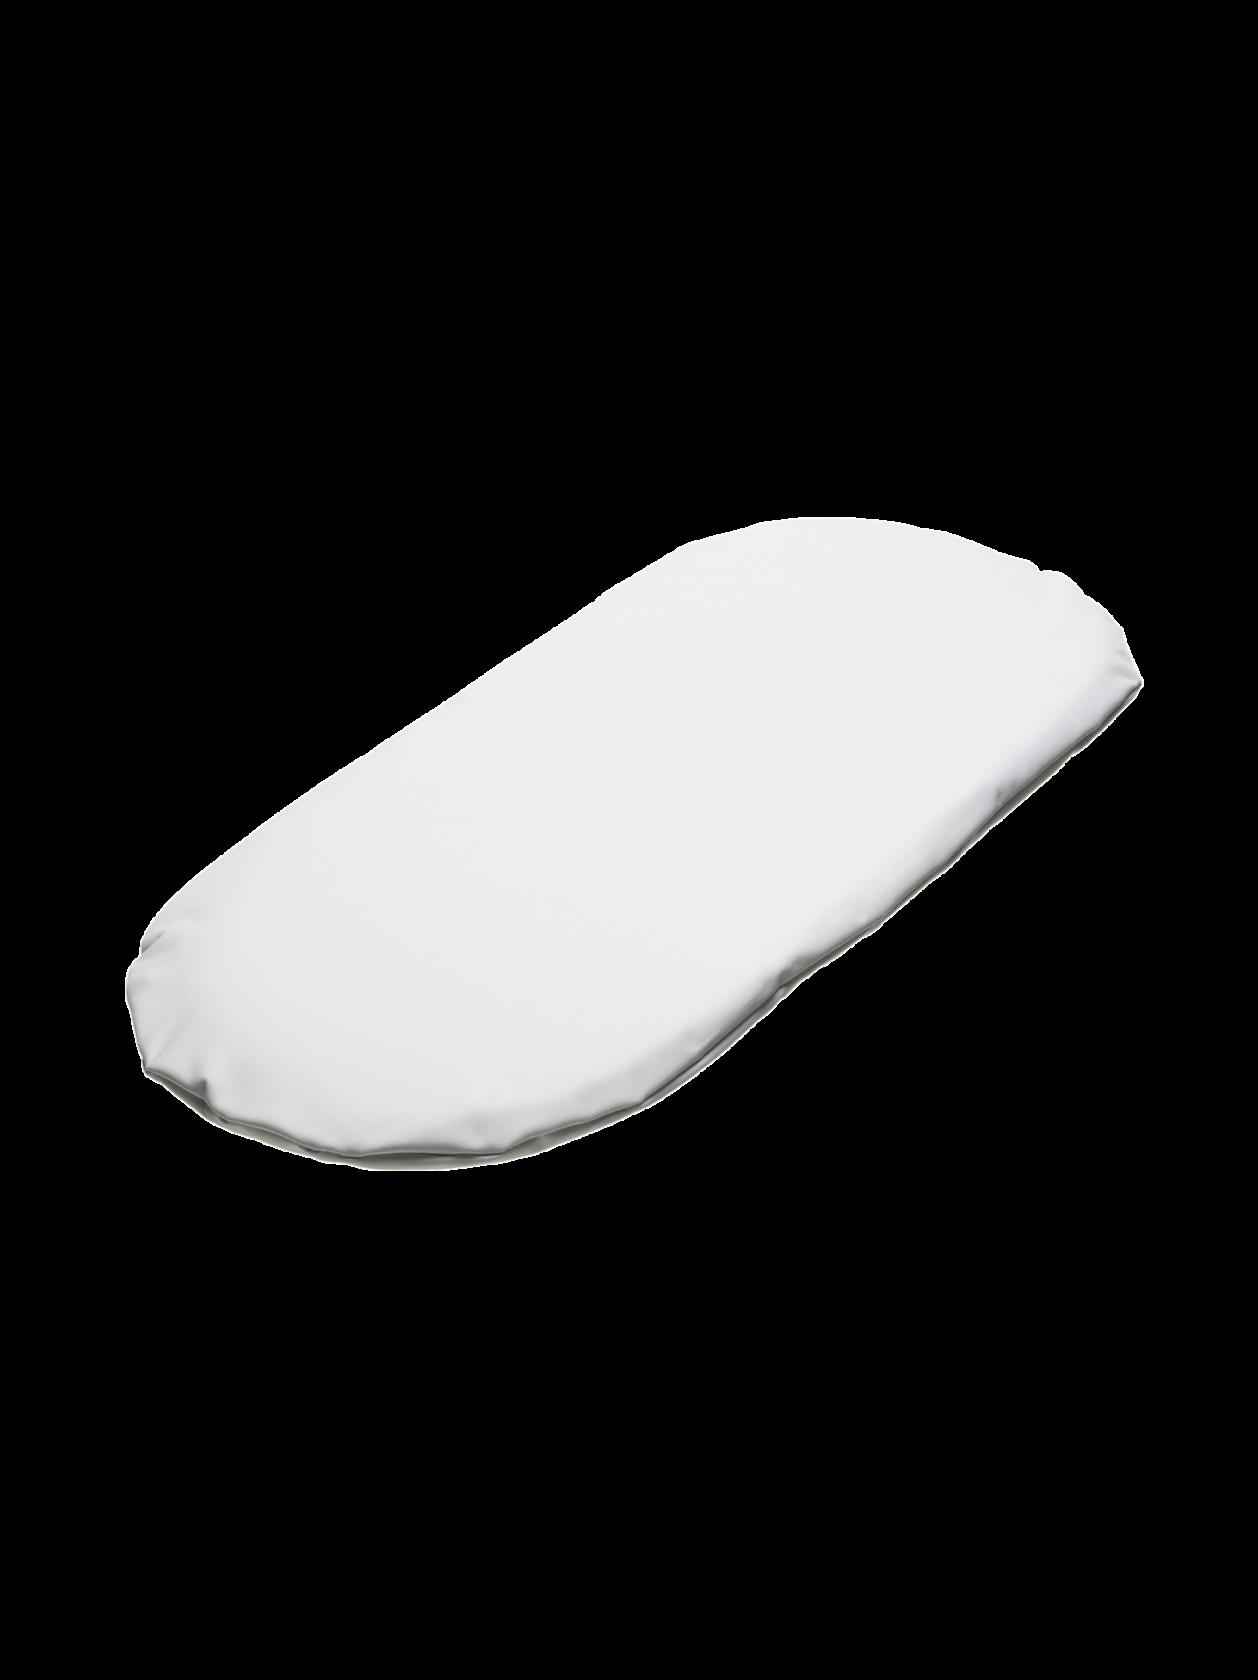 Cherry Carrycot Mattress White